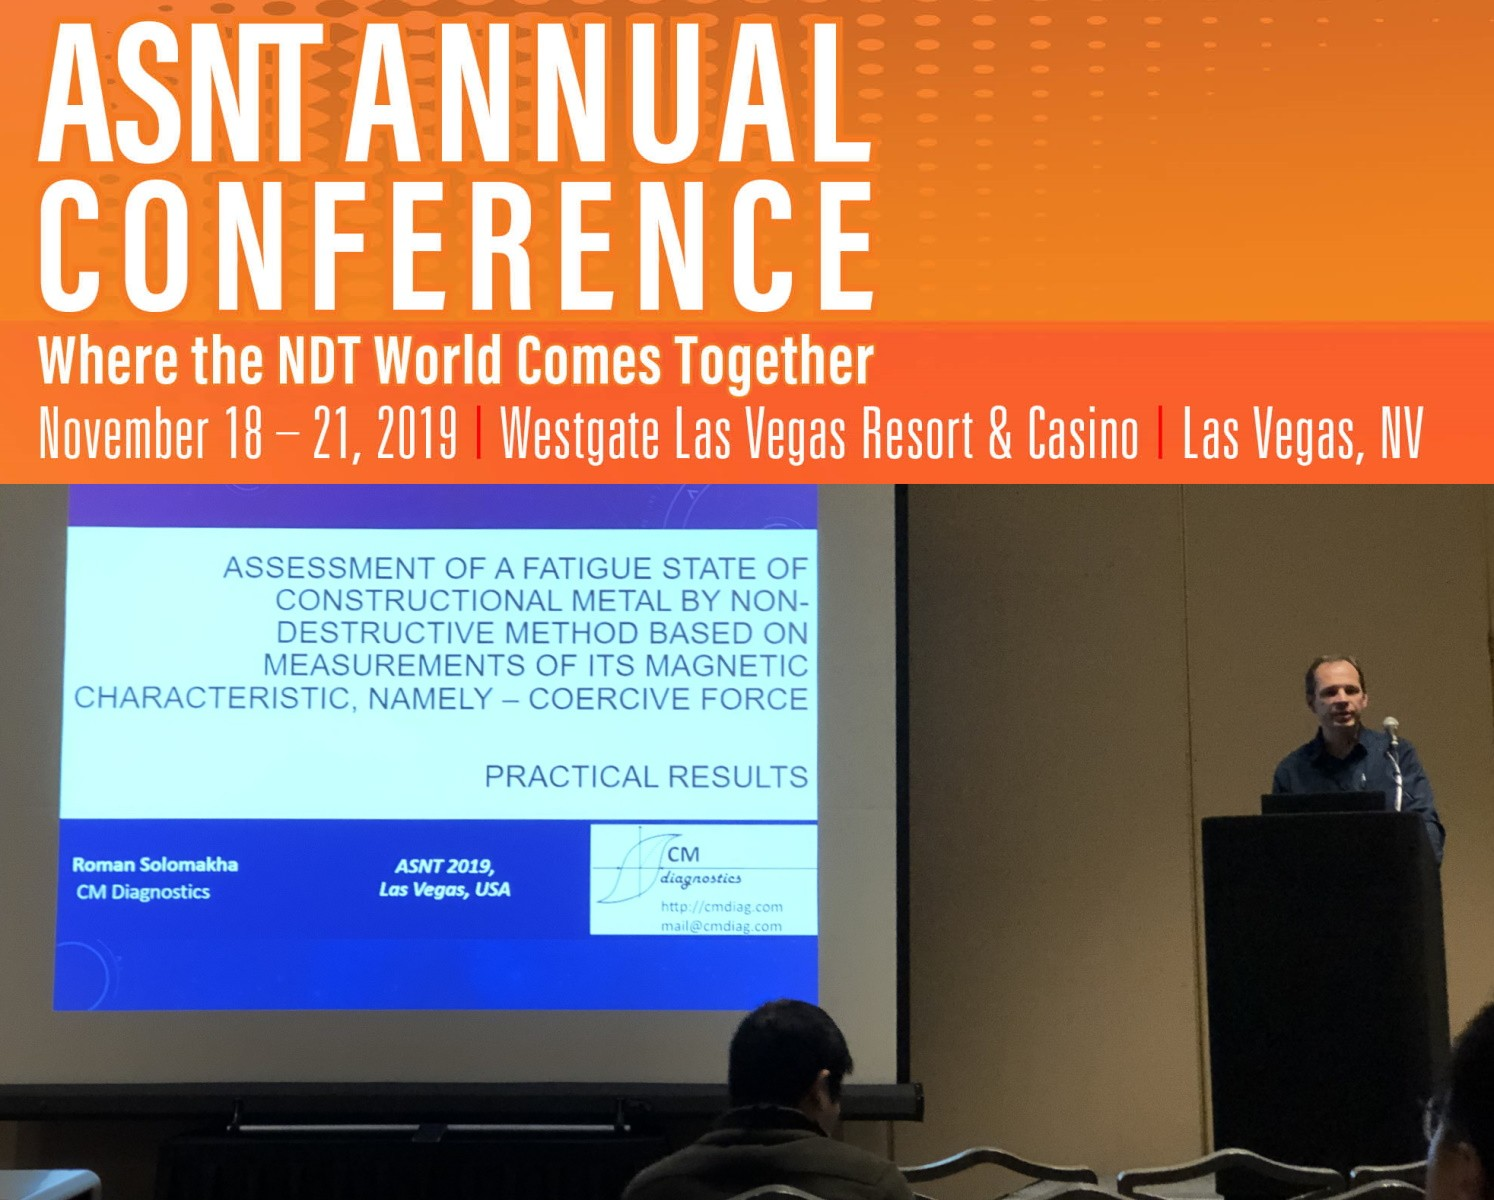 CM DIAGNOSTICS at ASNT Annual Conference 2019